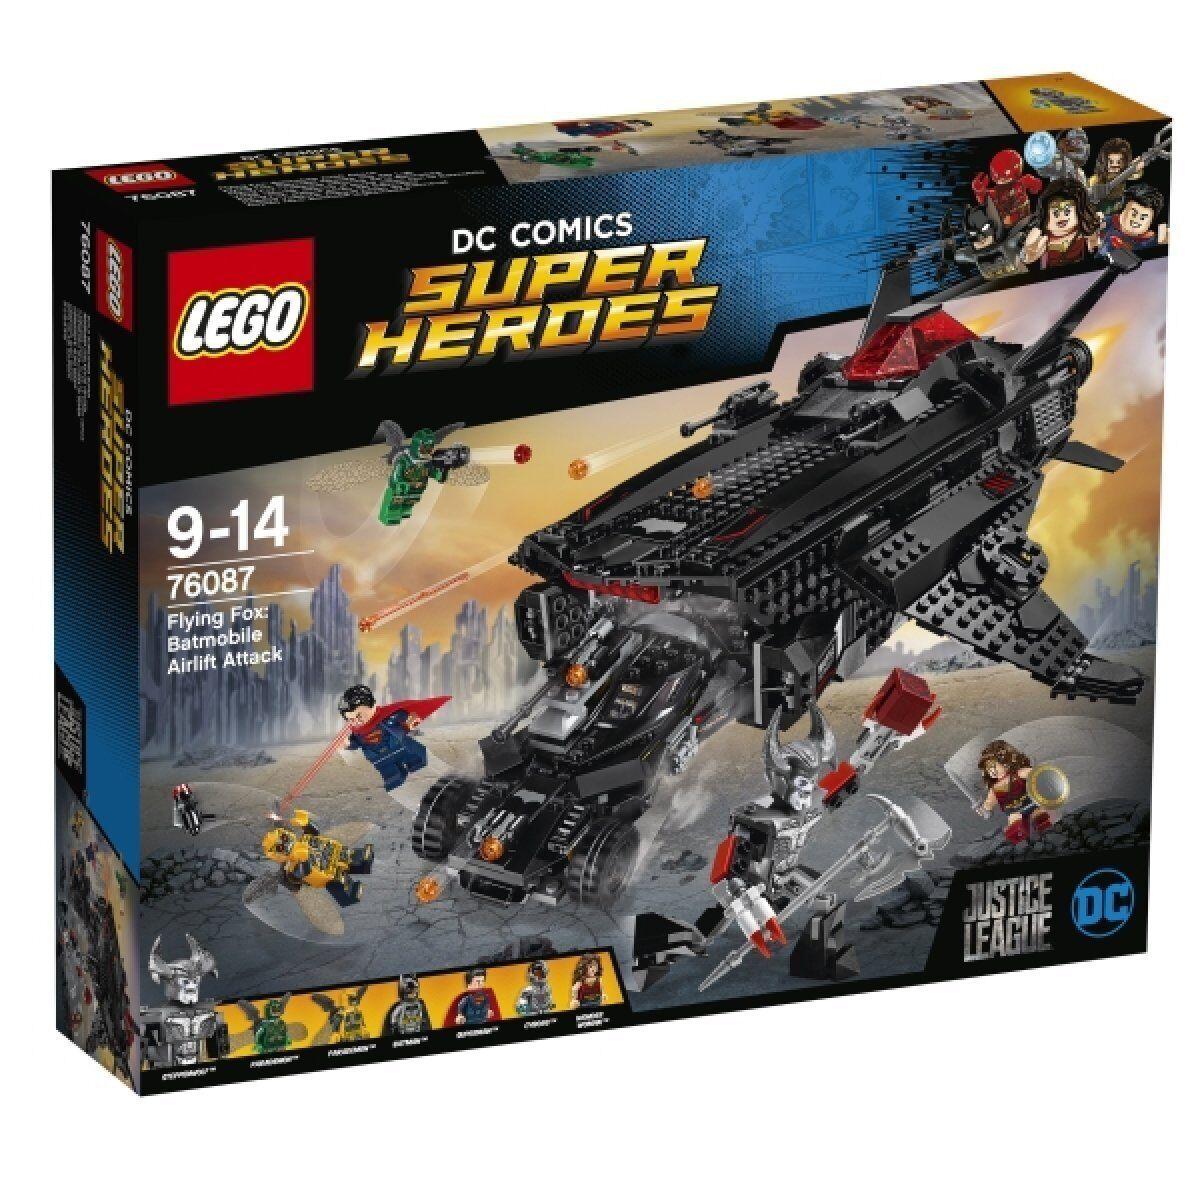 LEGO 76087 DC Comics Super Heroes Flying Fox Batmobil-Attacke aus der Luft NEU